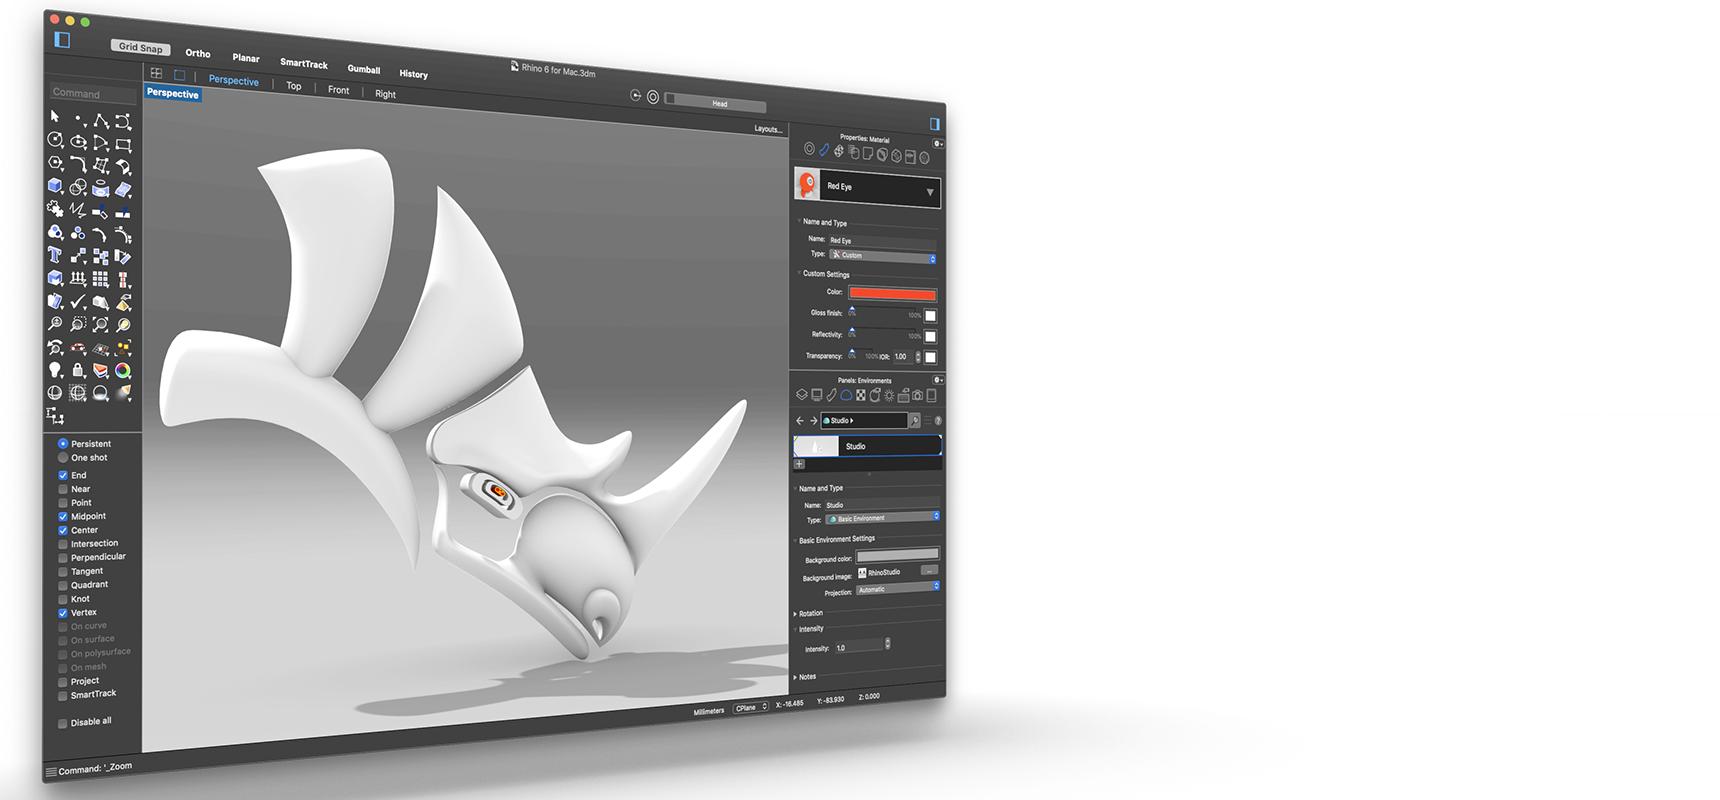 rhinoceros software free download windows 7 32 bit